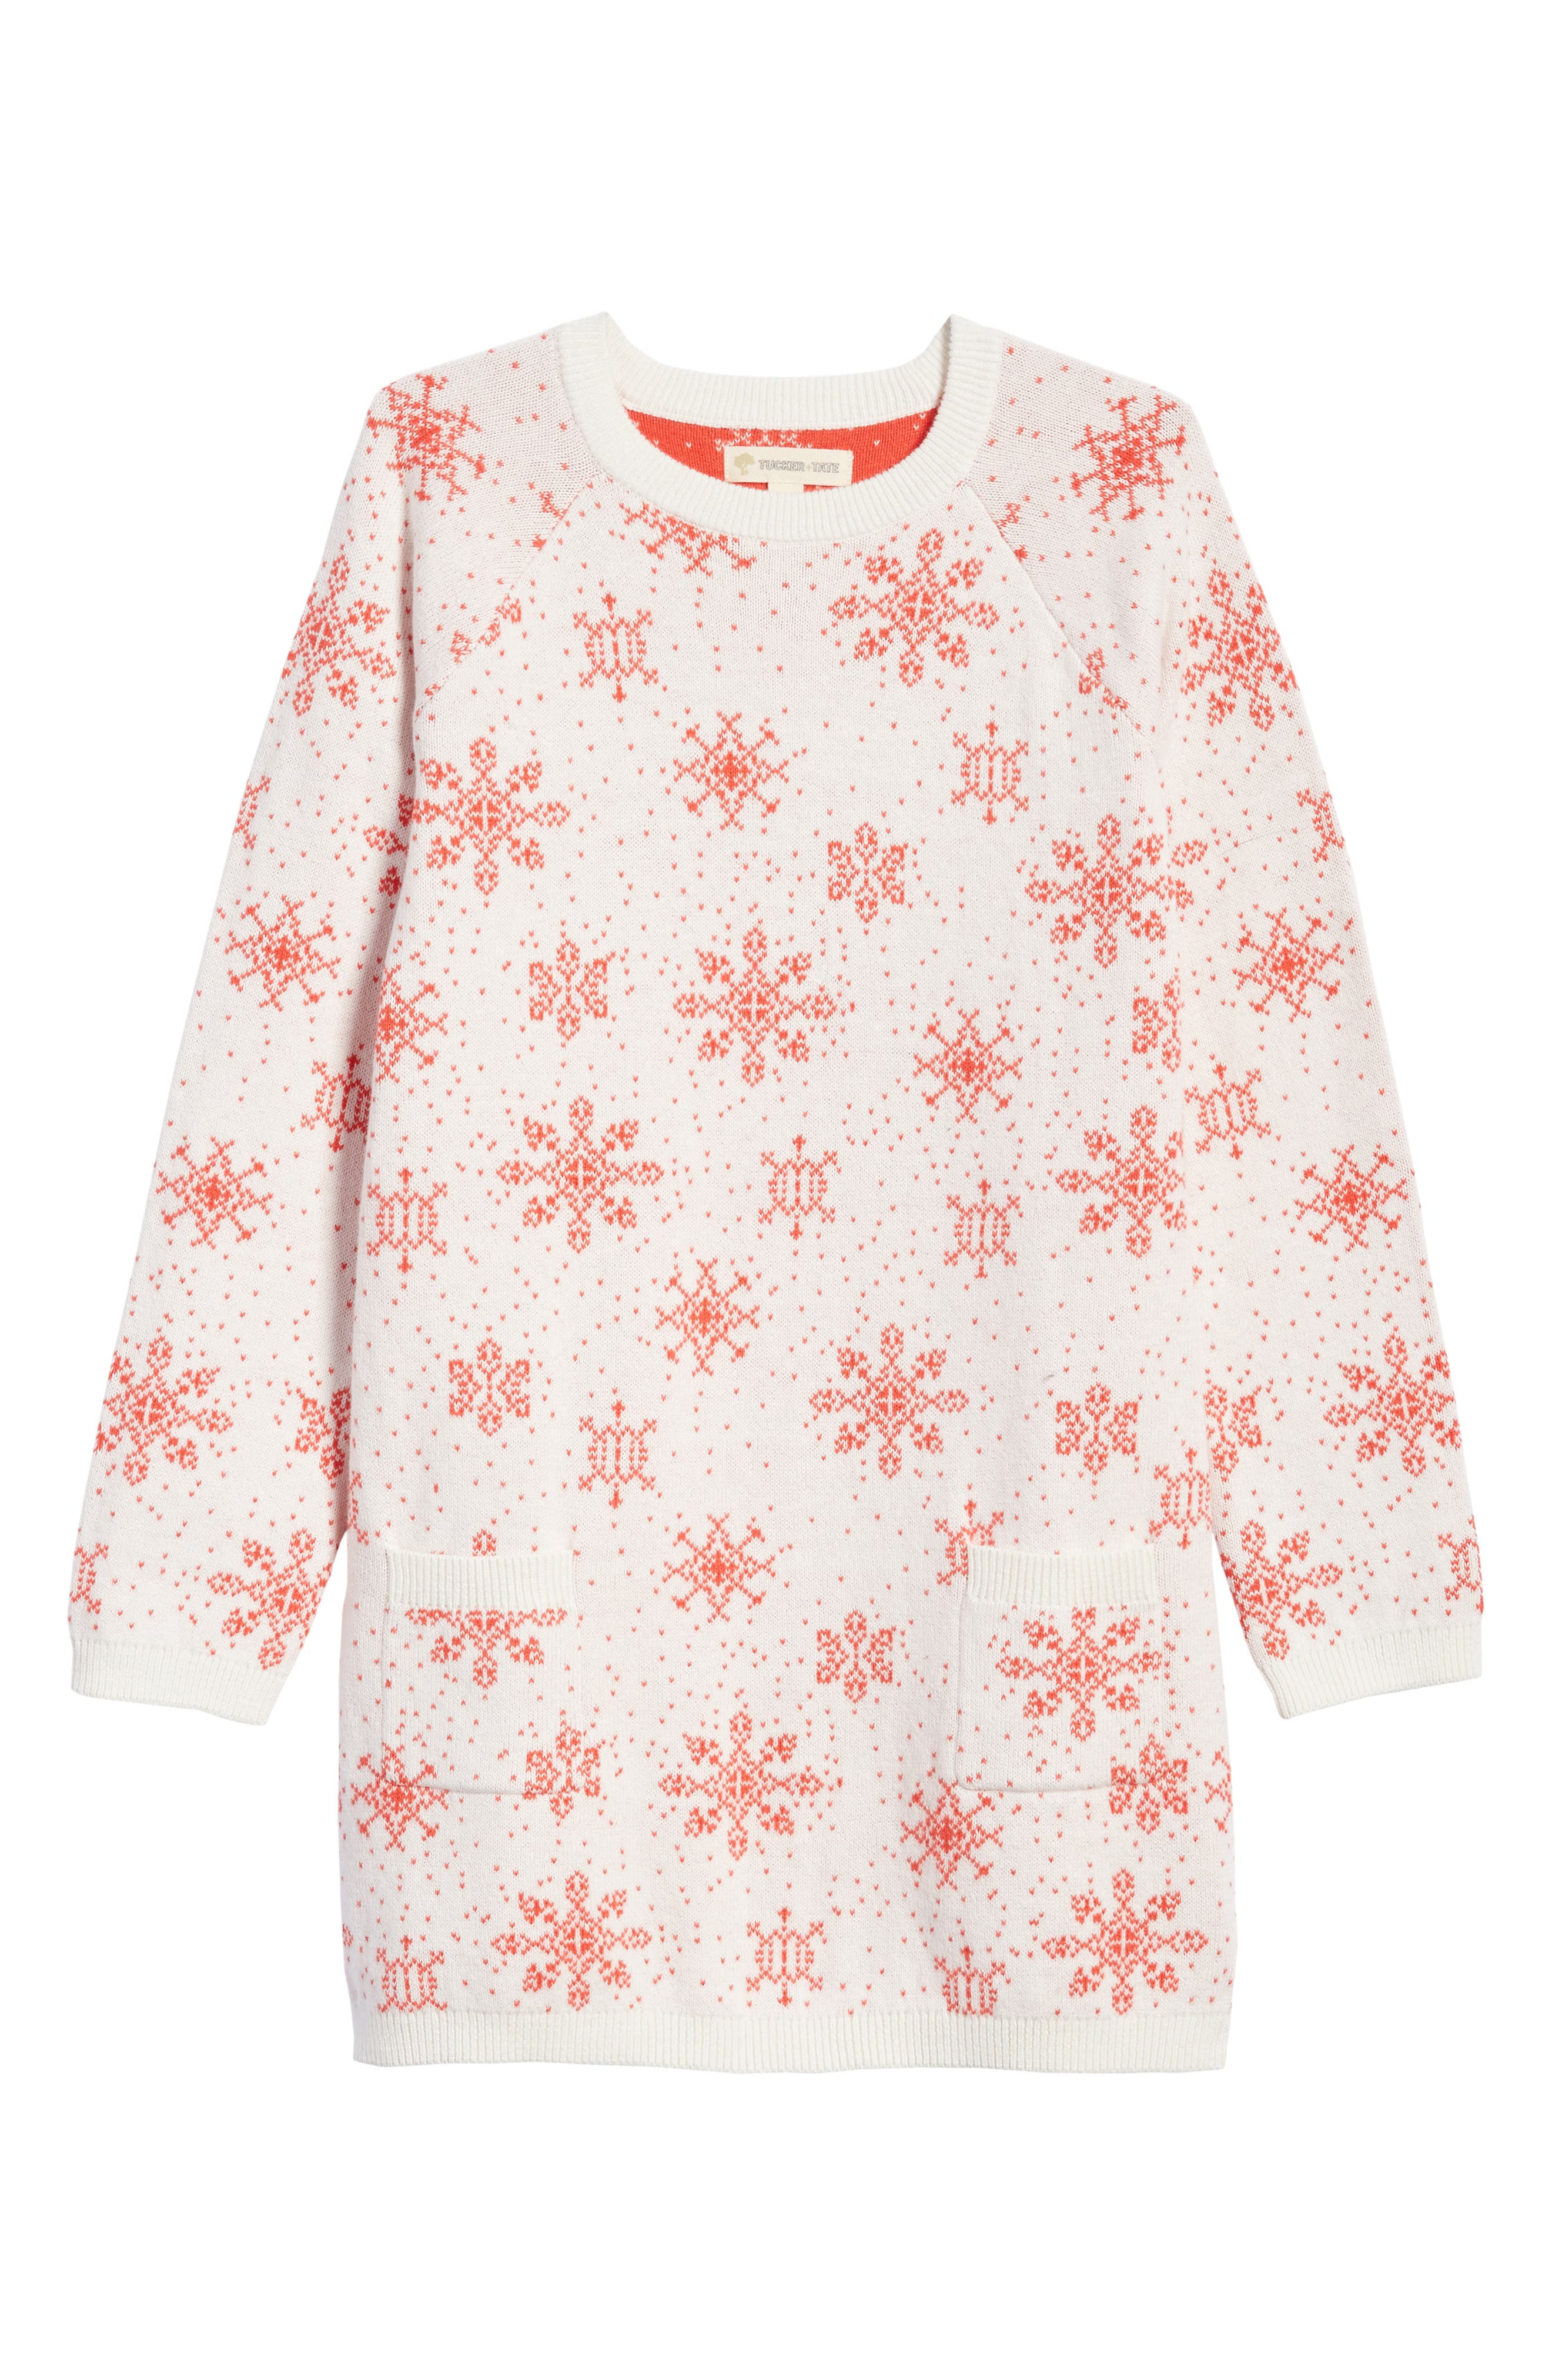 Main Image - Tucker + Tate Cotton & Cashmere Sweater Dress (Toddler Girls, Little Girls & Big Girls)